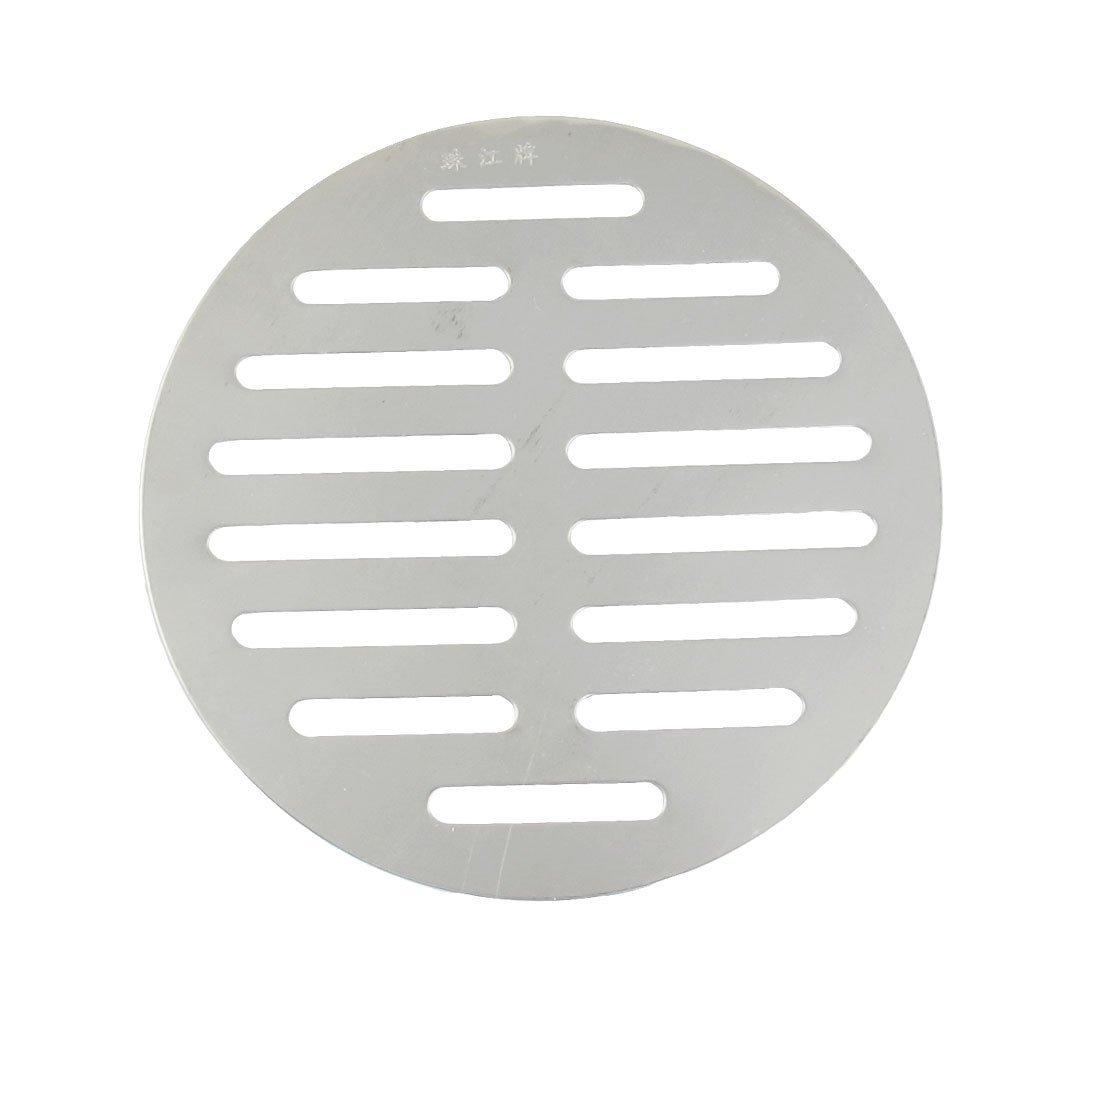 Fengh argento tondo in acciaio INOX scarico a pavimento cover-bathroom forniture